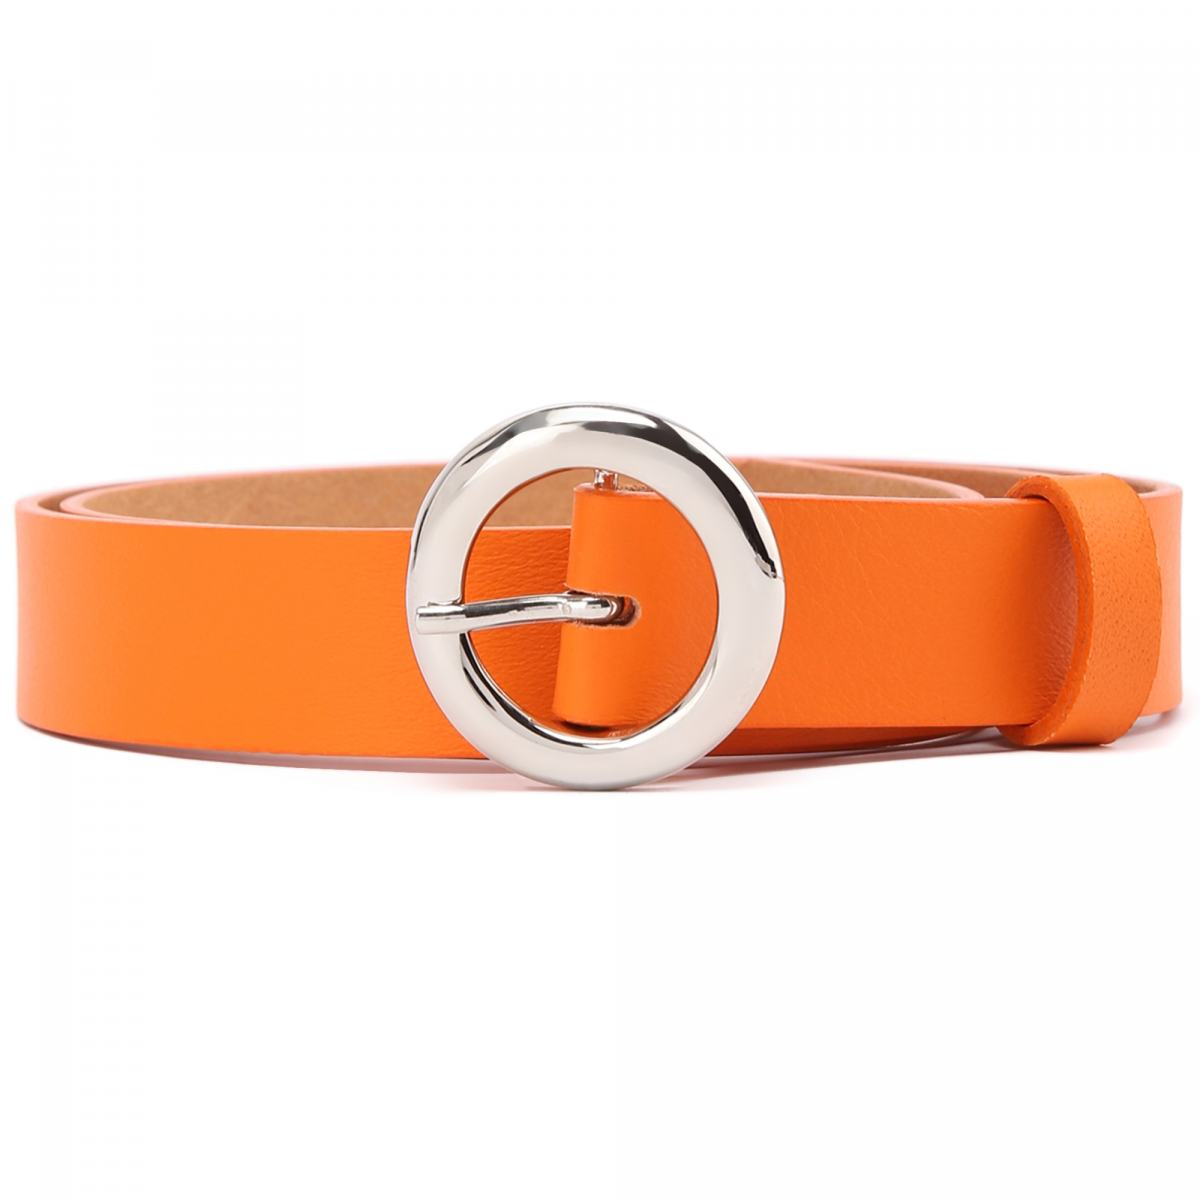 Ремень Baldinini оранжевого цвета